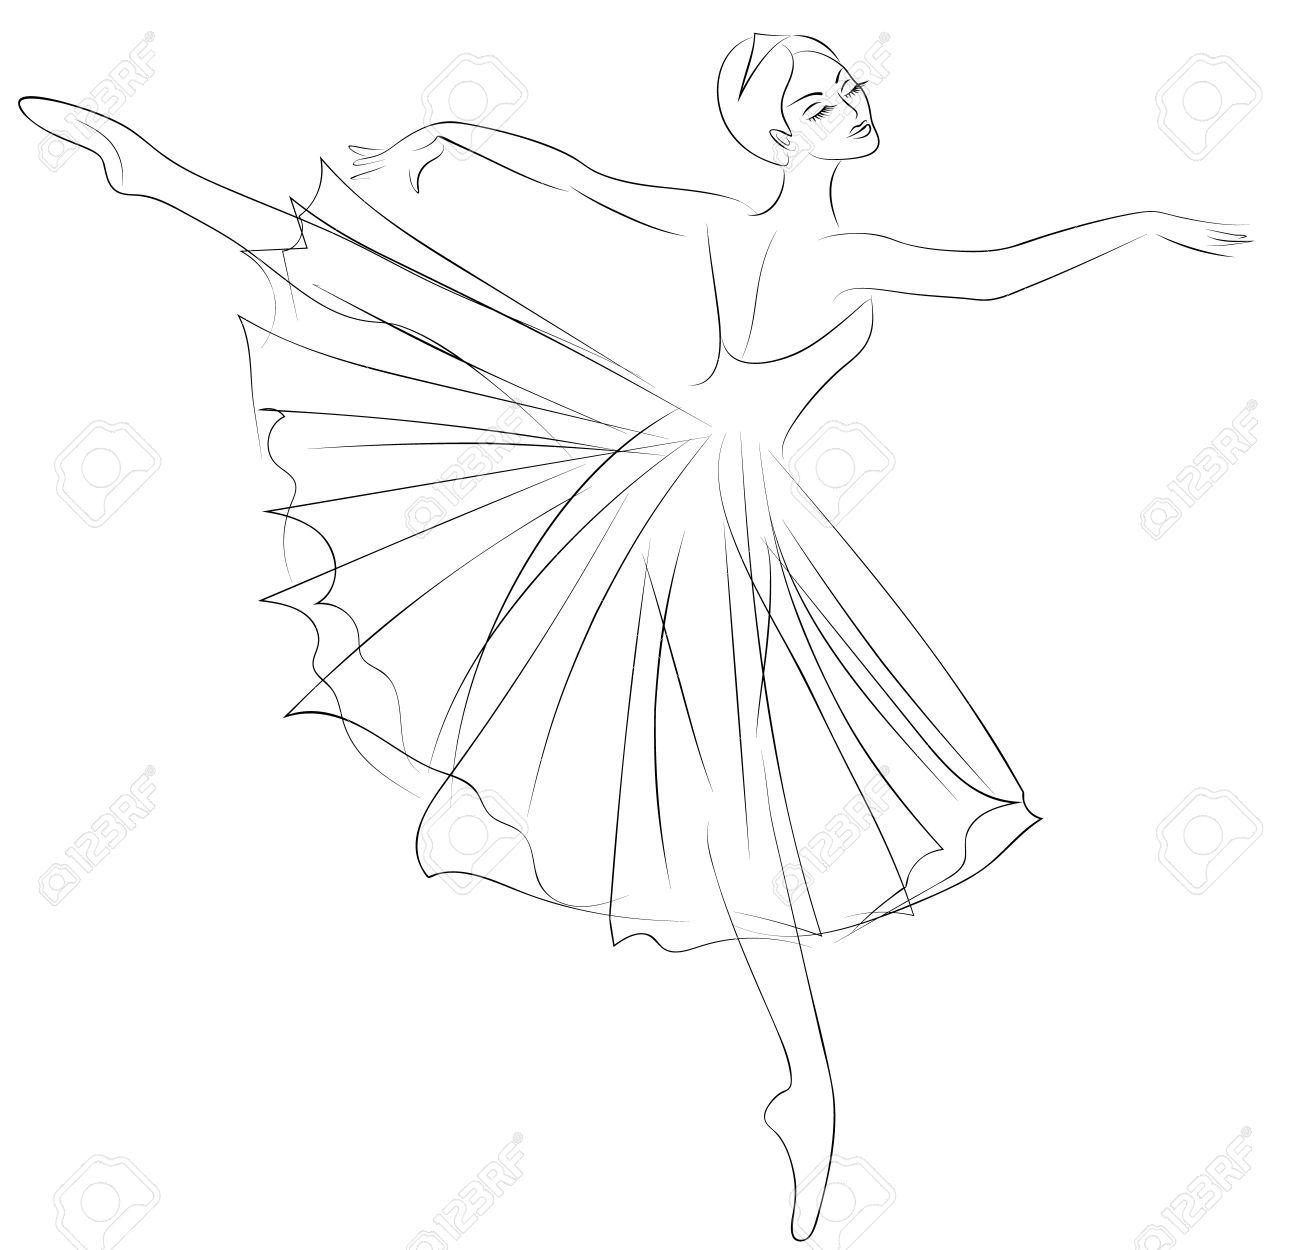 1300x1250 Outline Sketch Of Dancing Ballerina In Beautiful Dress Royalty